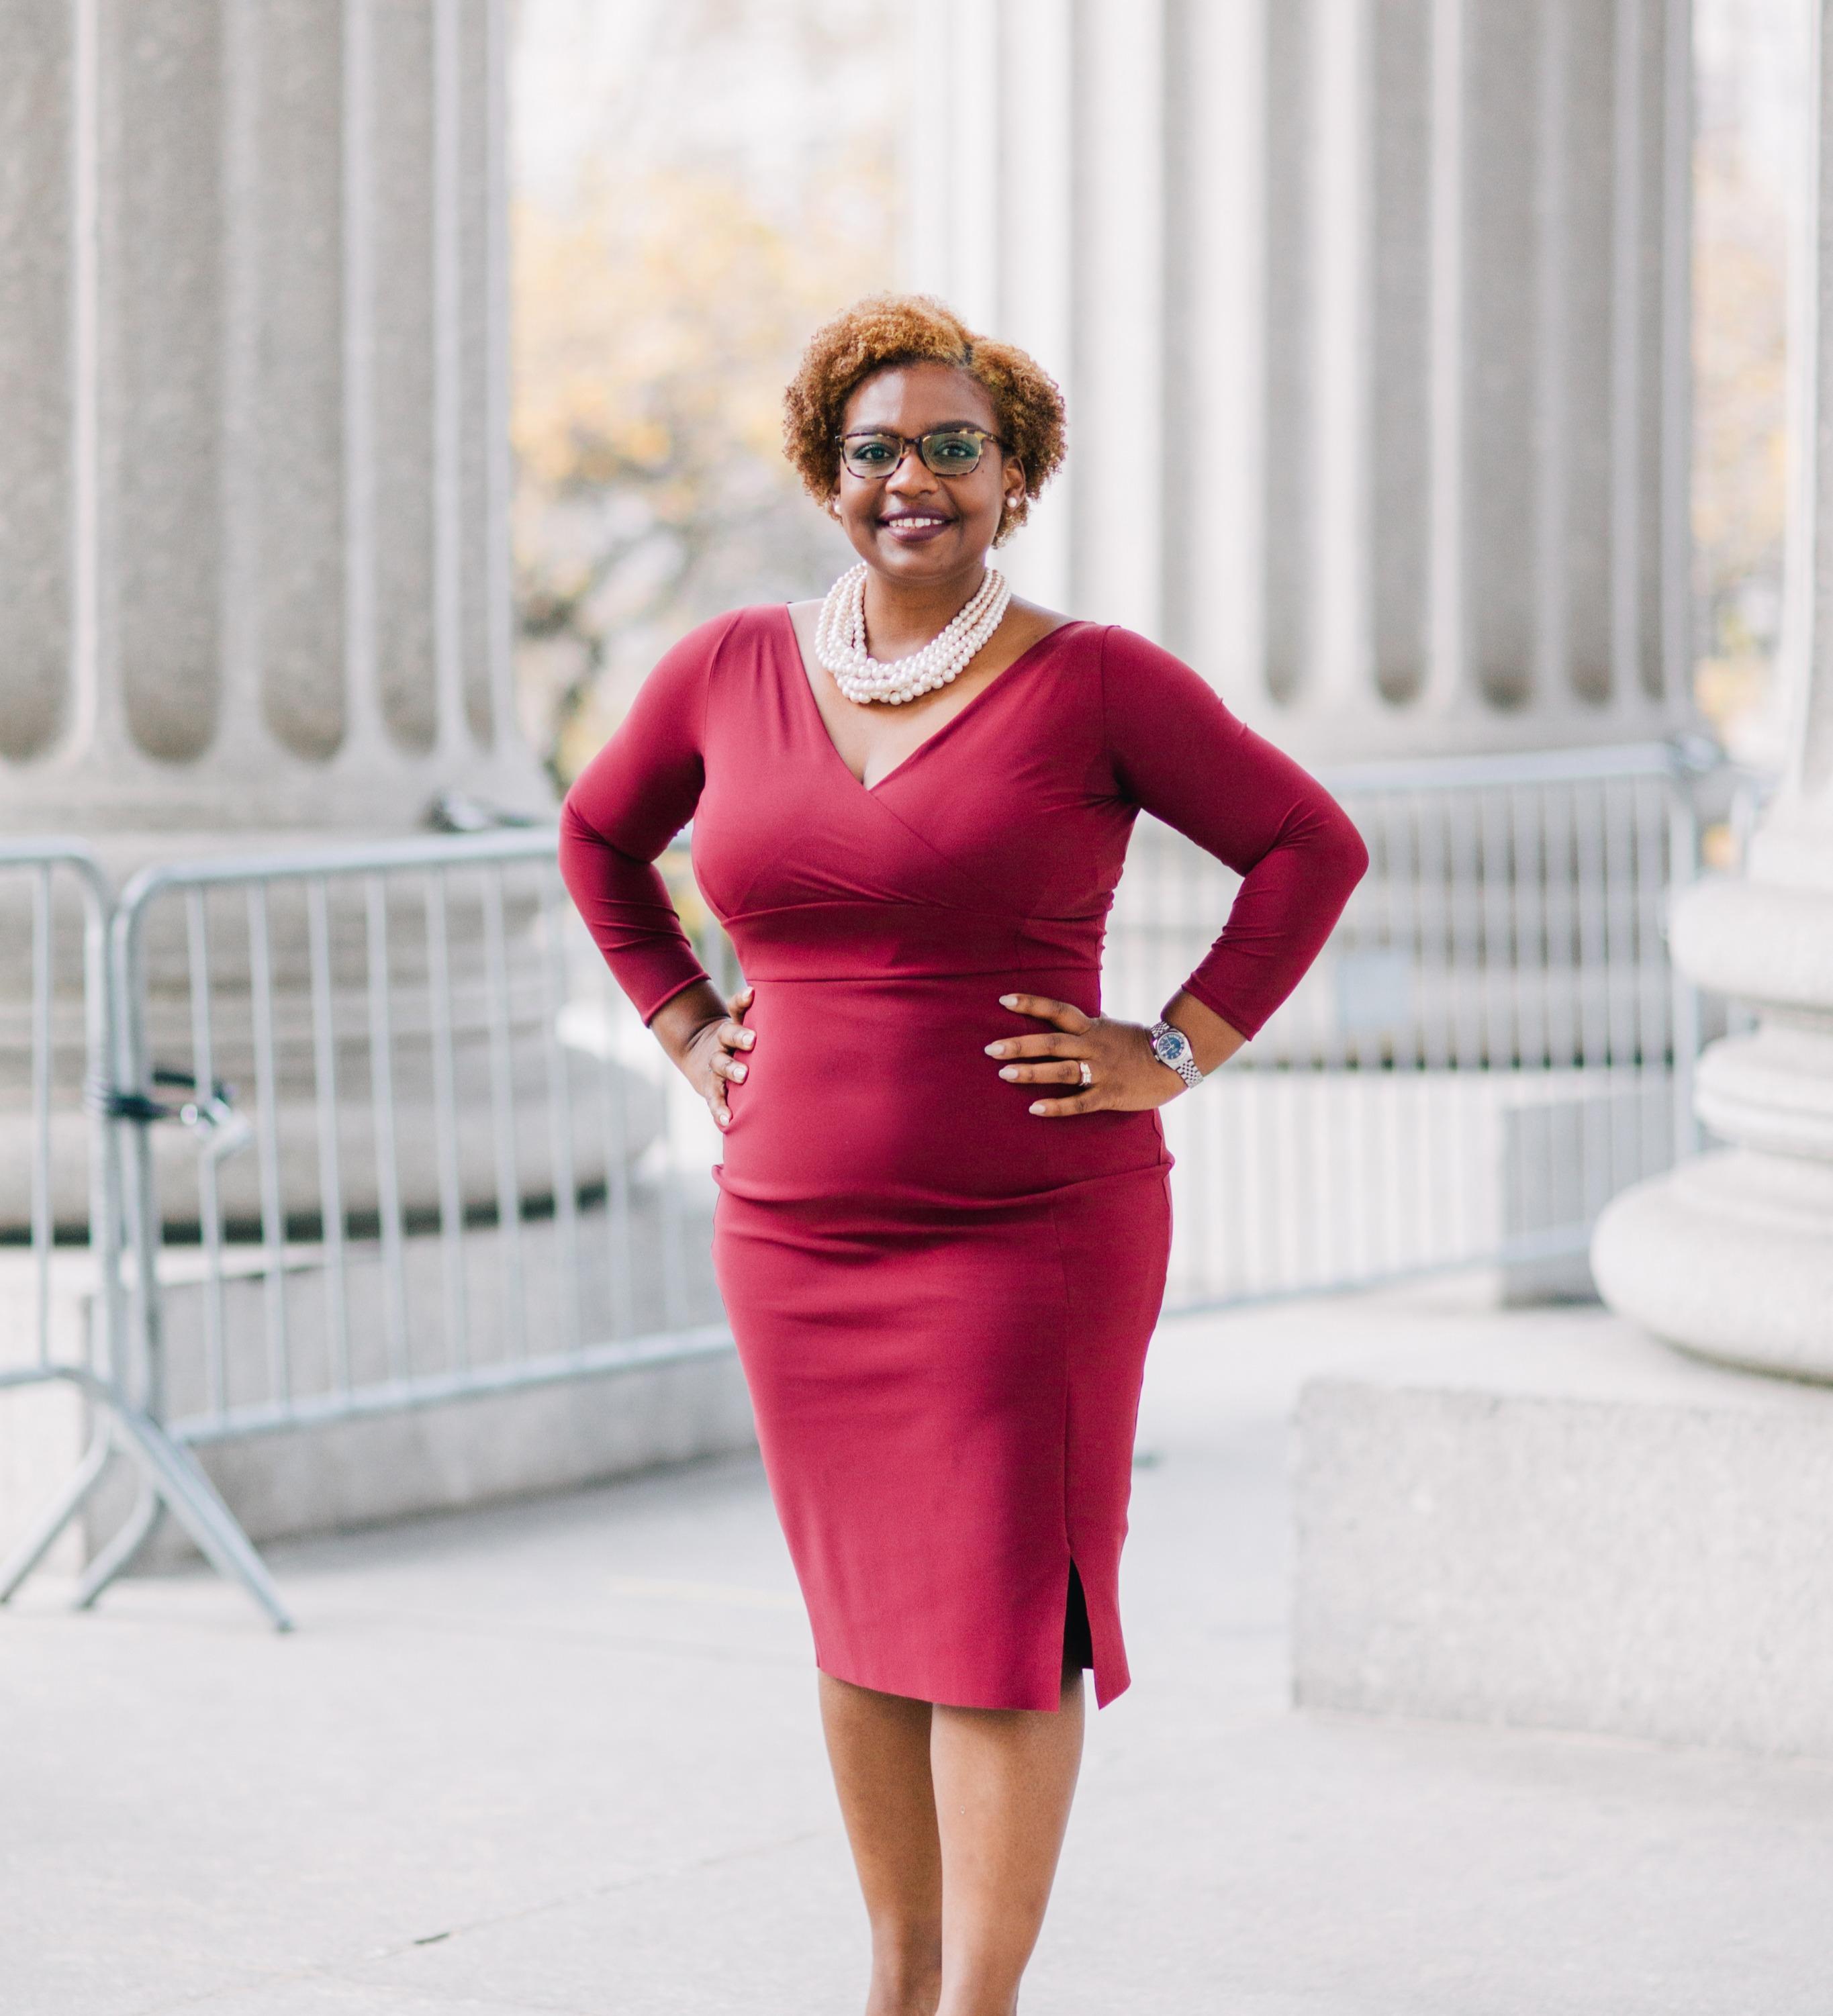 Marjorie Mesidor's Profile Image